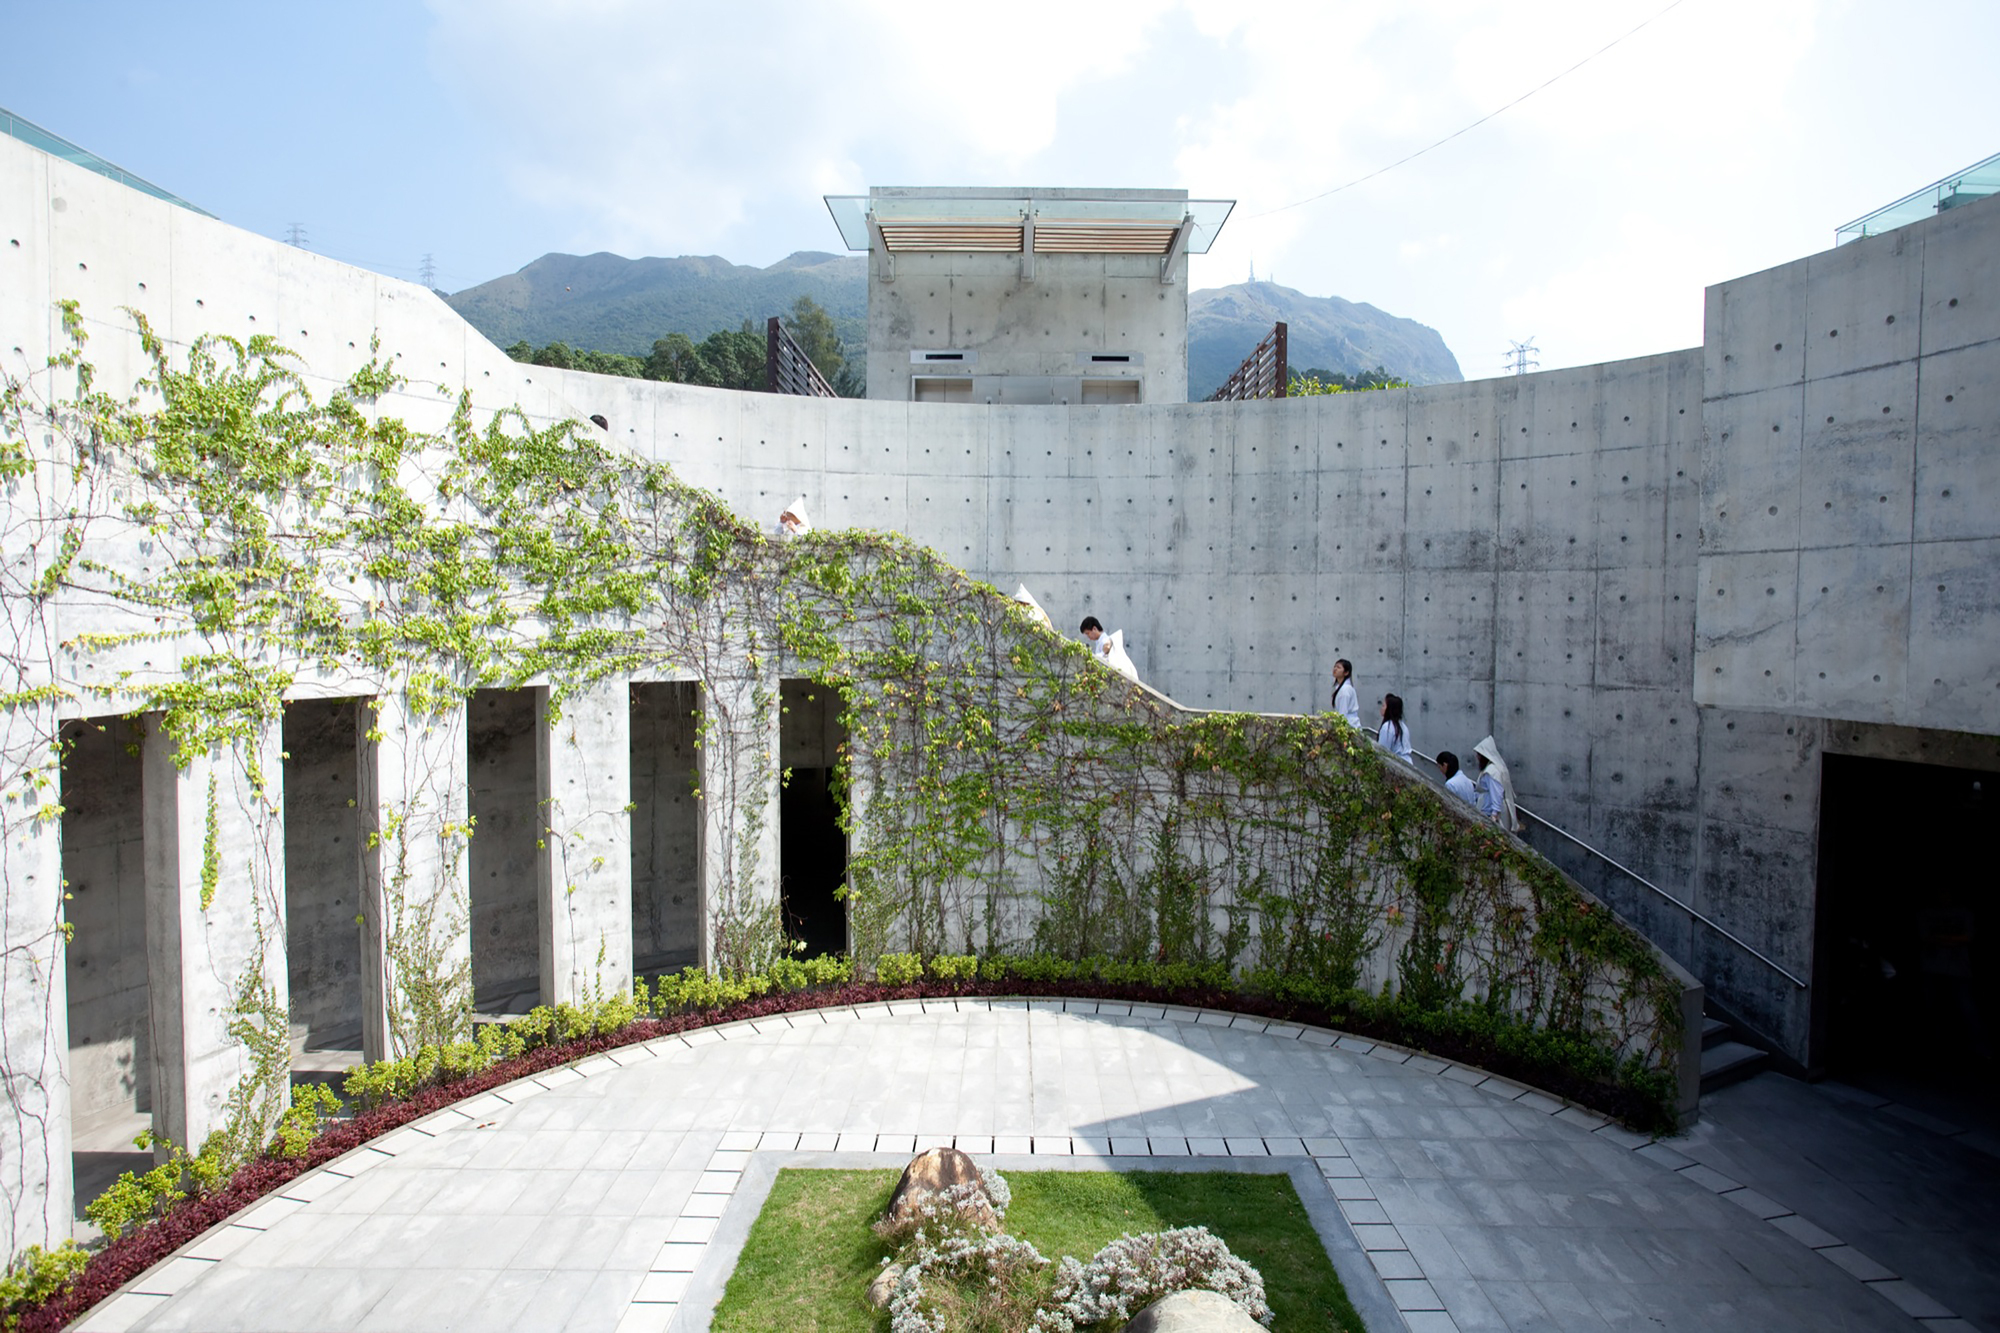 Diamond hill crematorium architectural services for Ads architectural design services